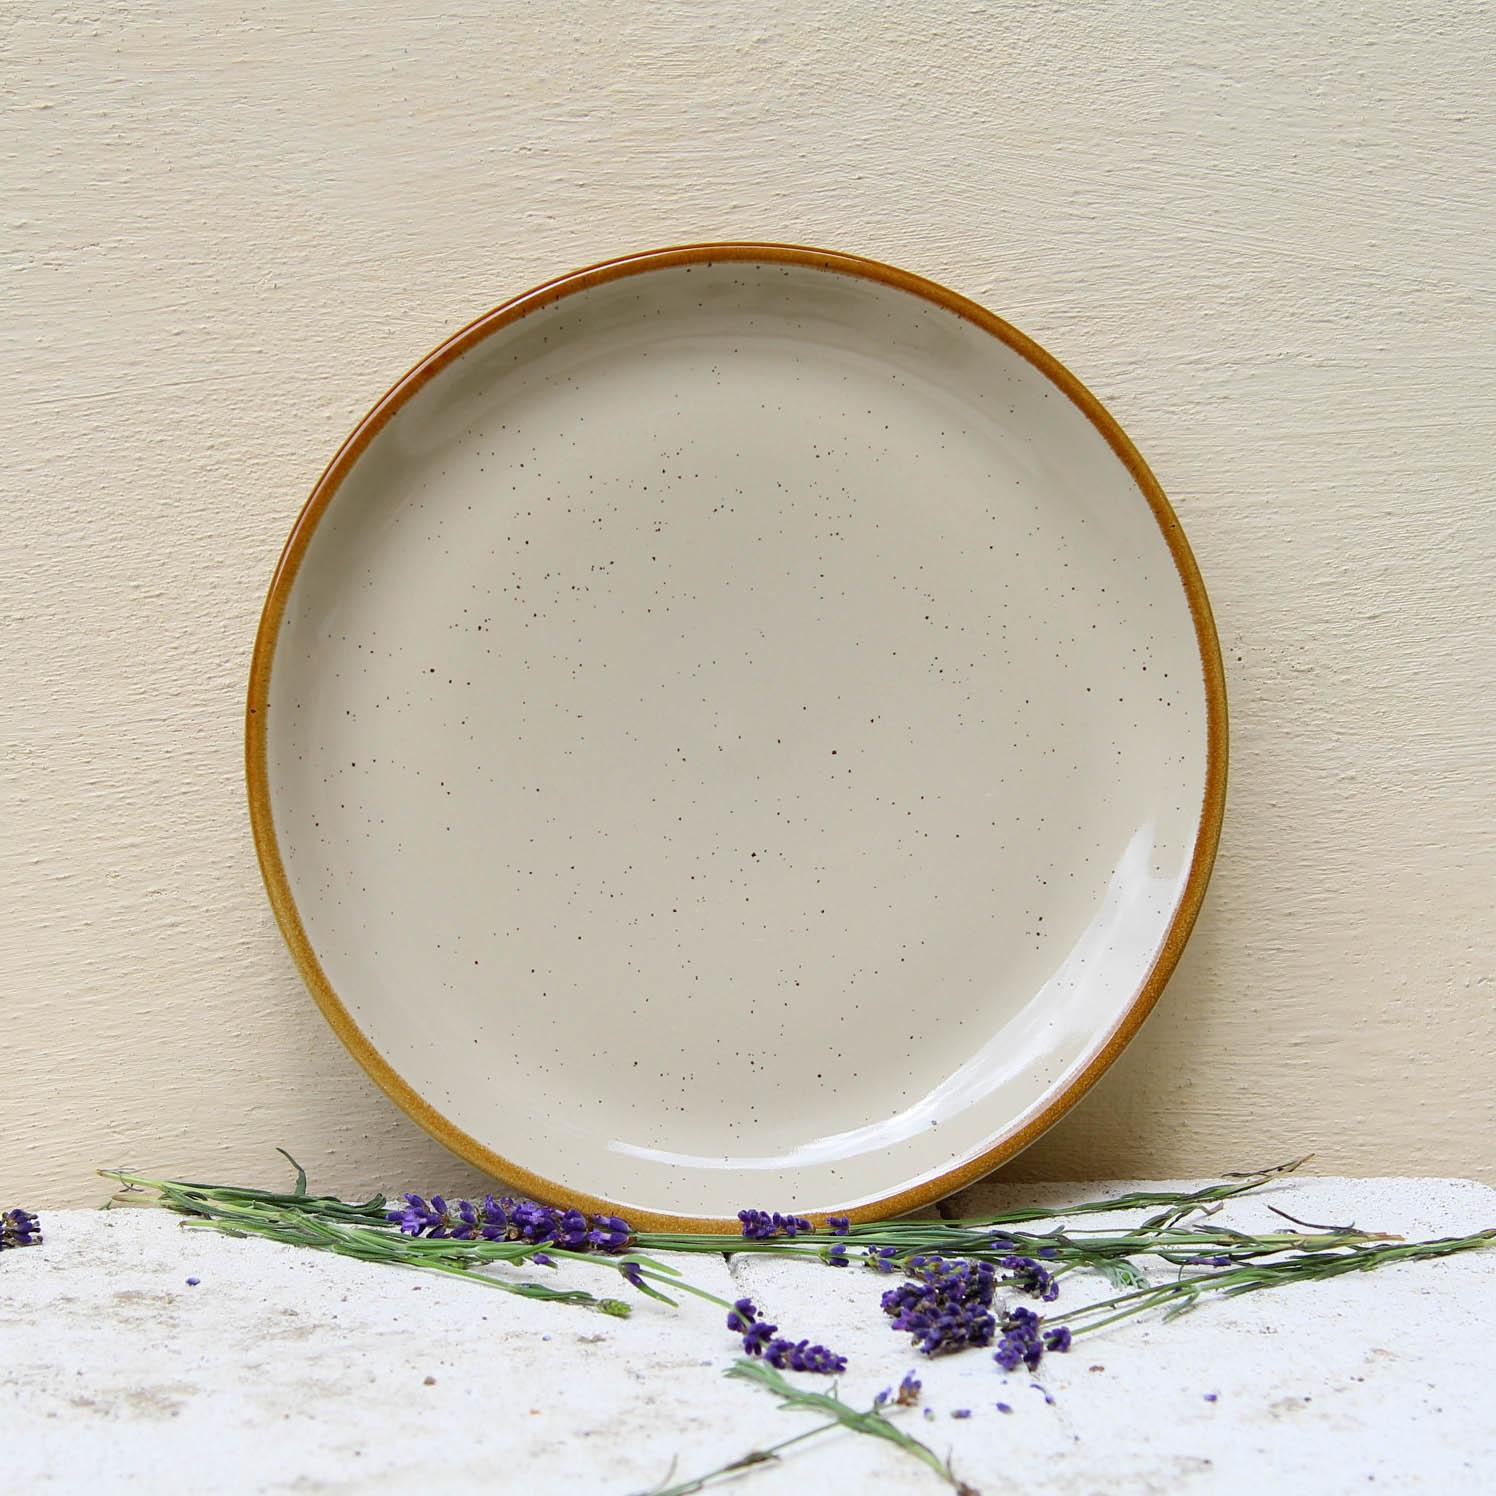 Farfurie intinsa Gardena din ceramica crem 24 cm chicville 2021